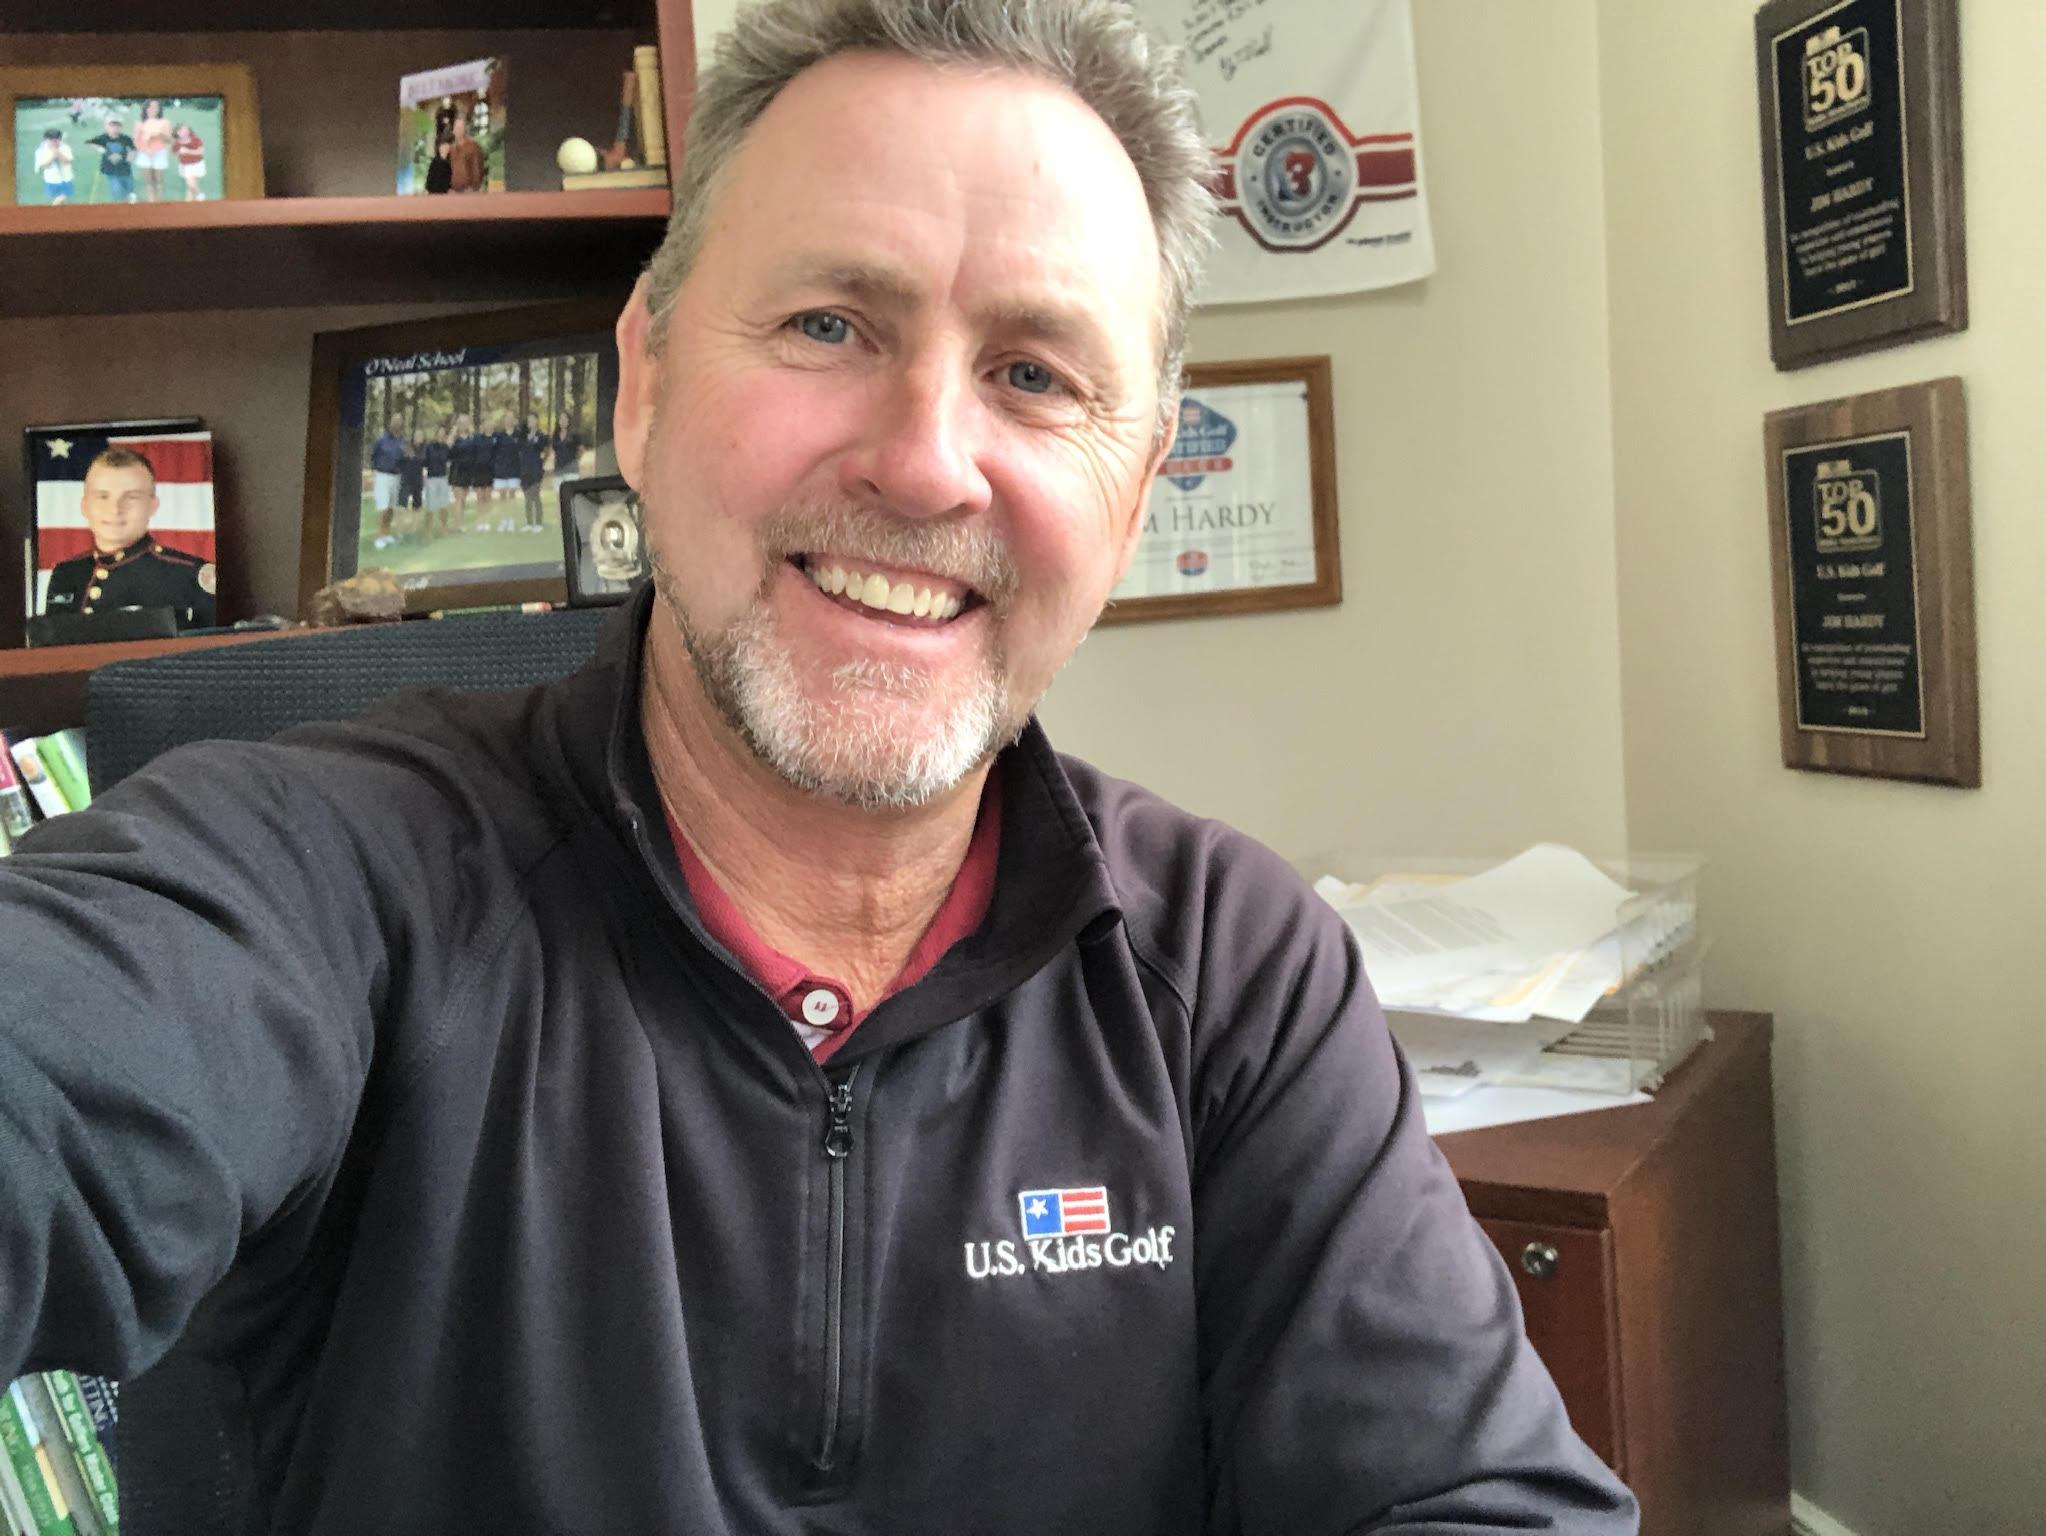 Senior Director, Academy Development U.S. Kids Golf, Longleaf Golf & Family Club